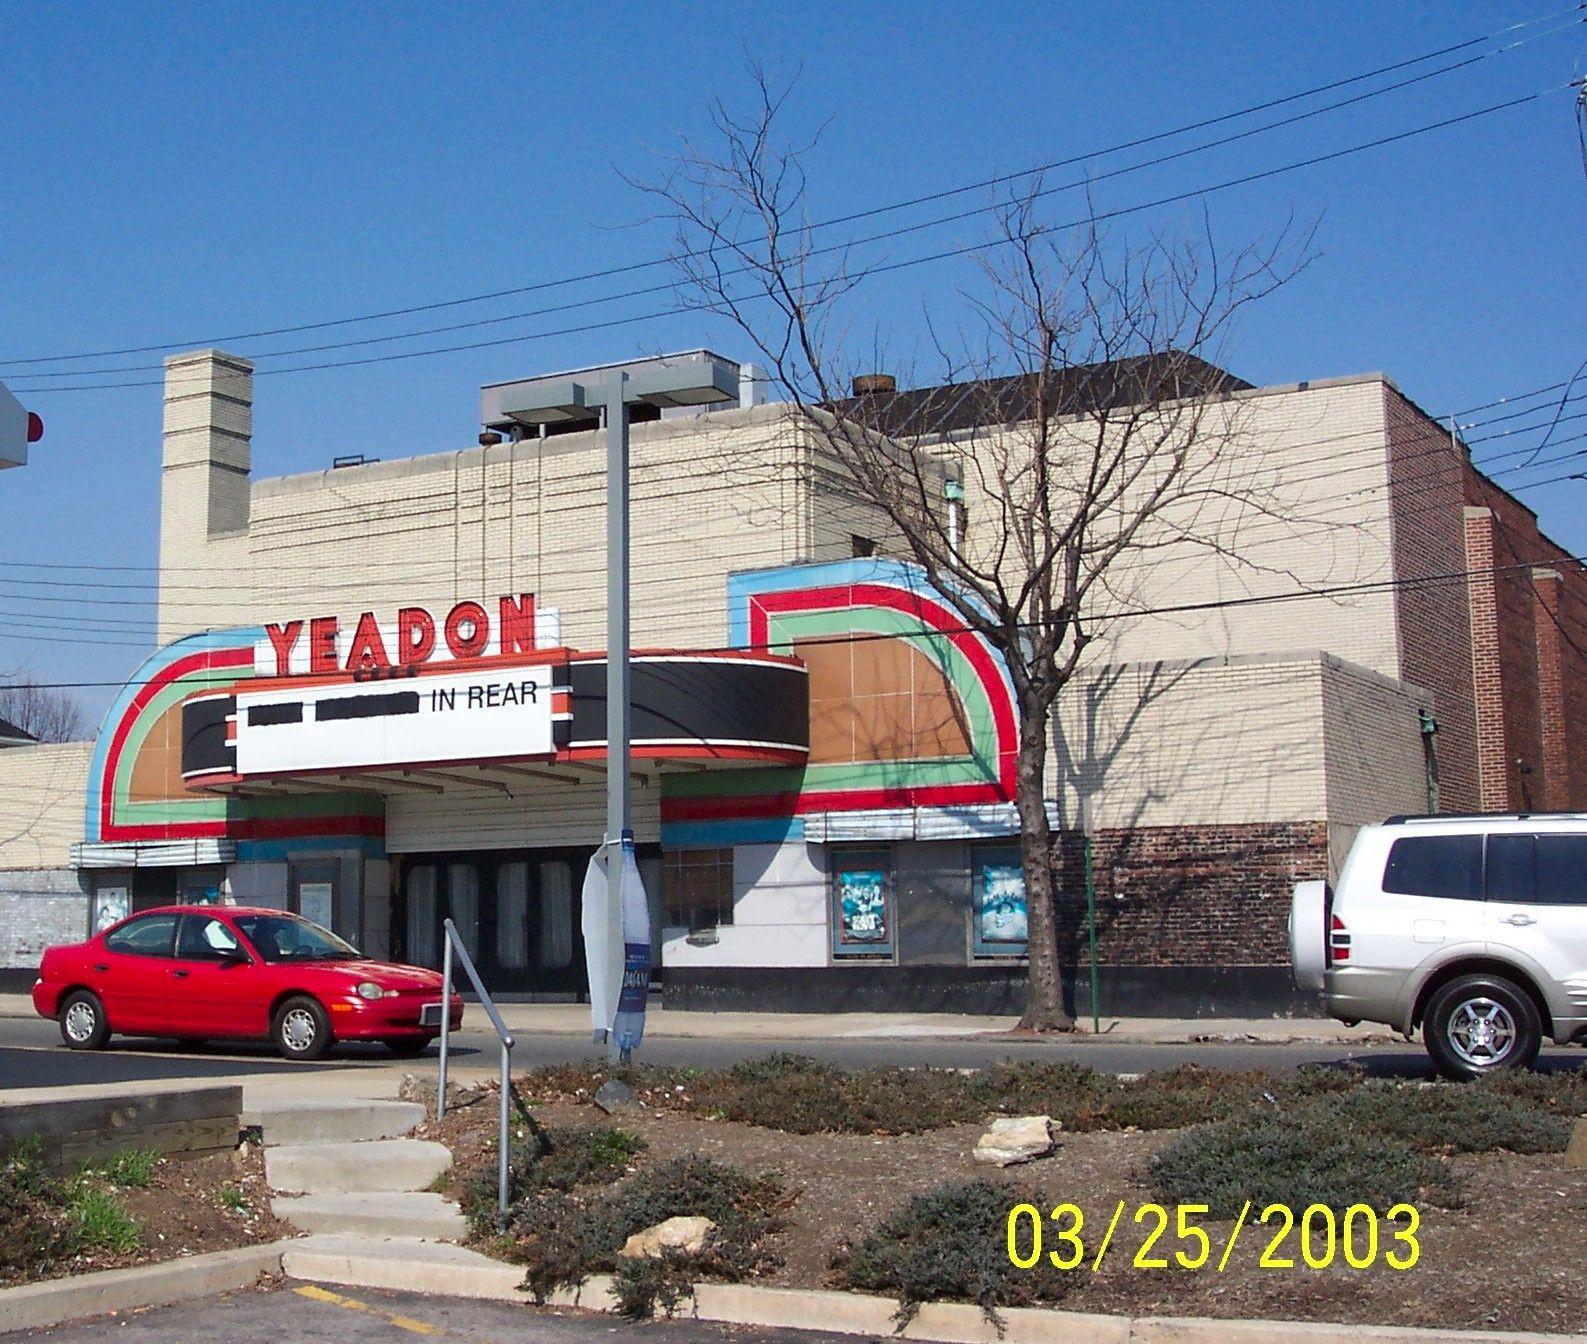 Yeadon Theater Yeadon Pa Movie Theater Childhood Memories Theatre